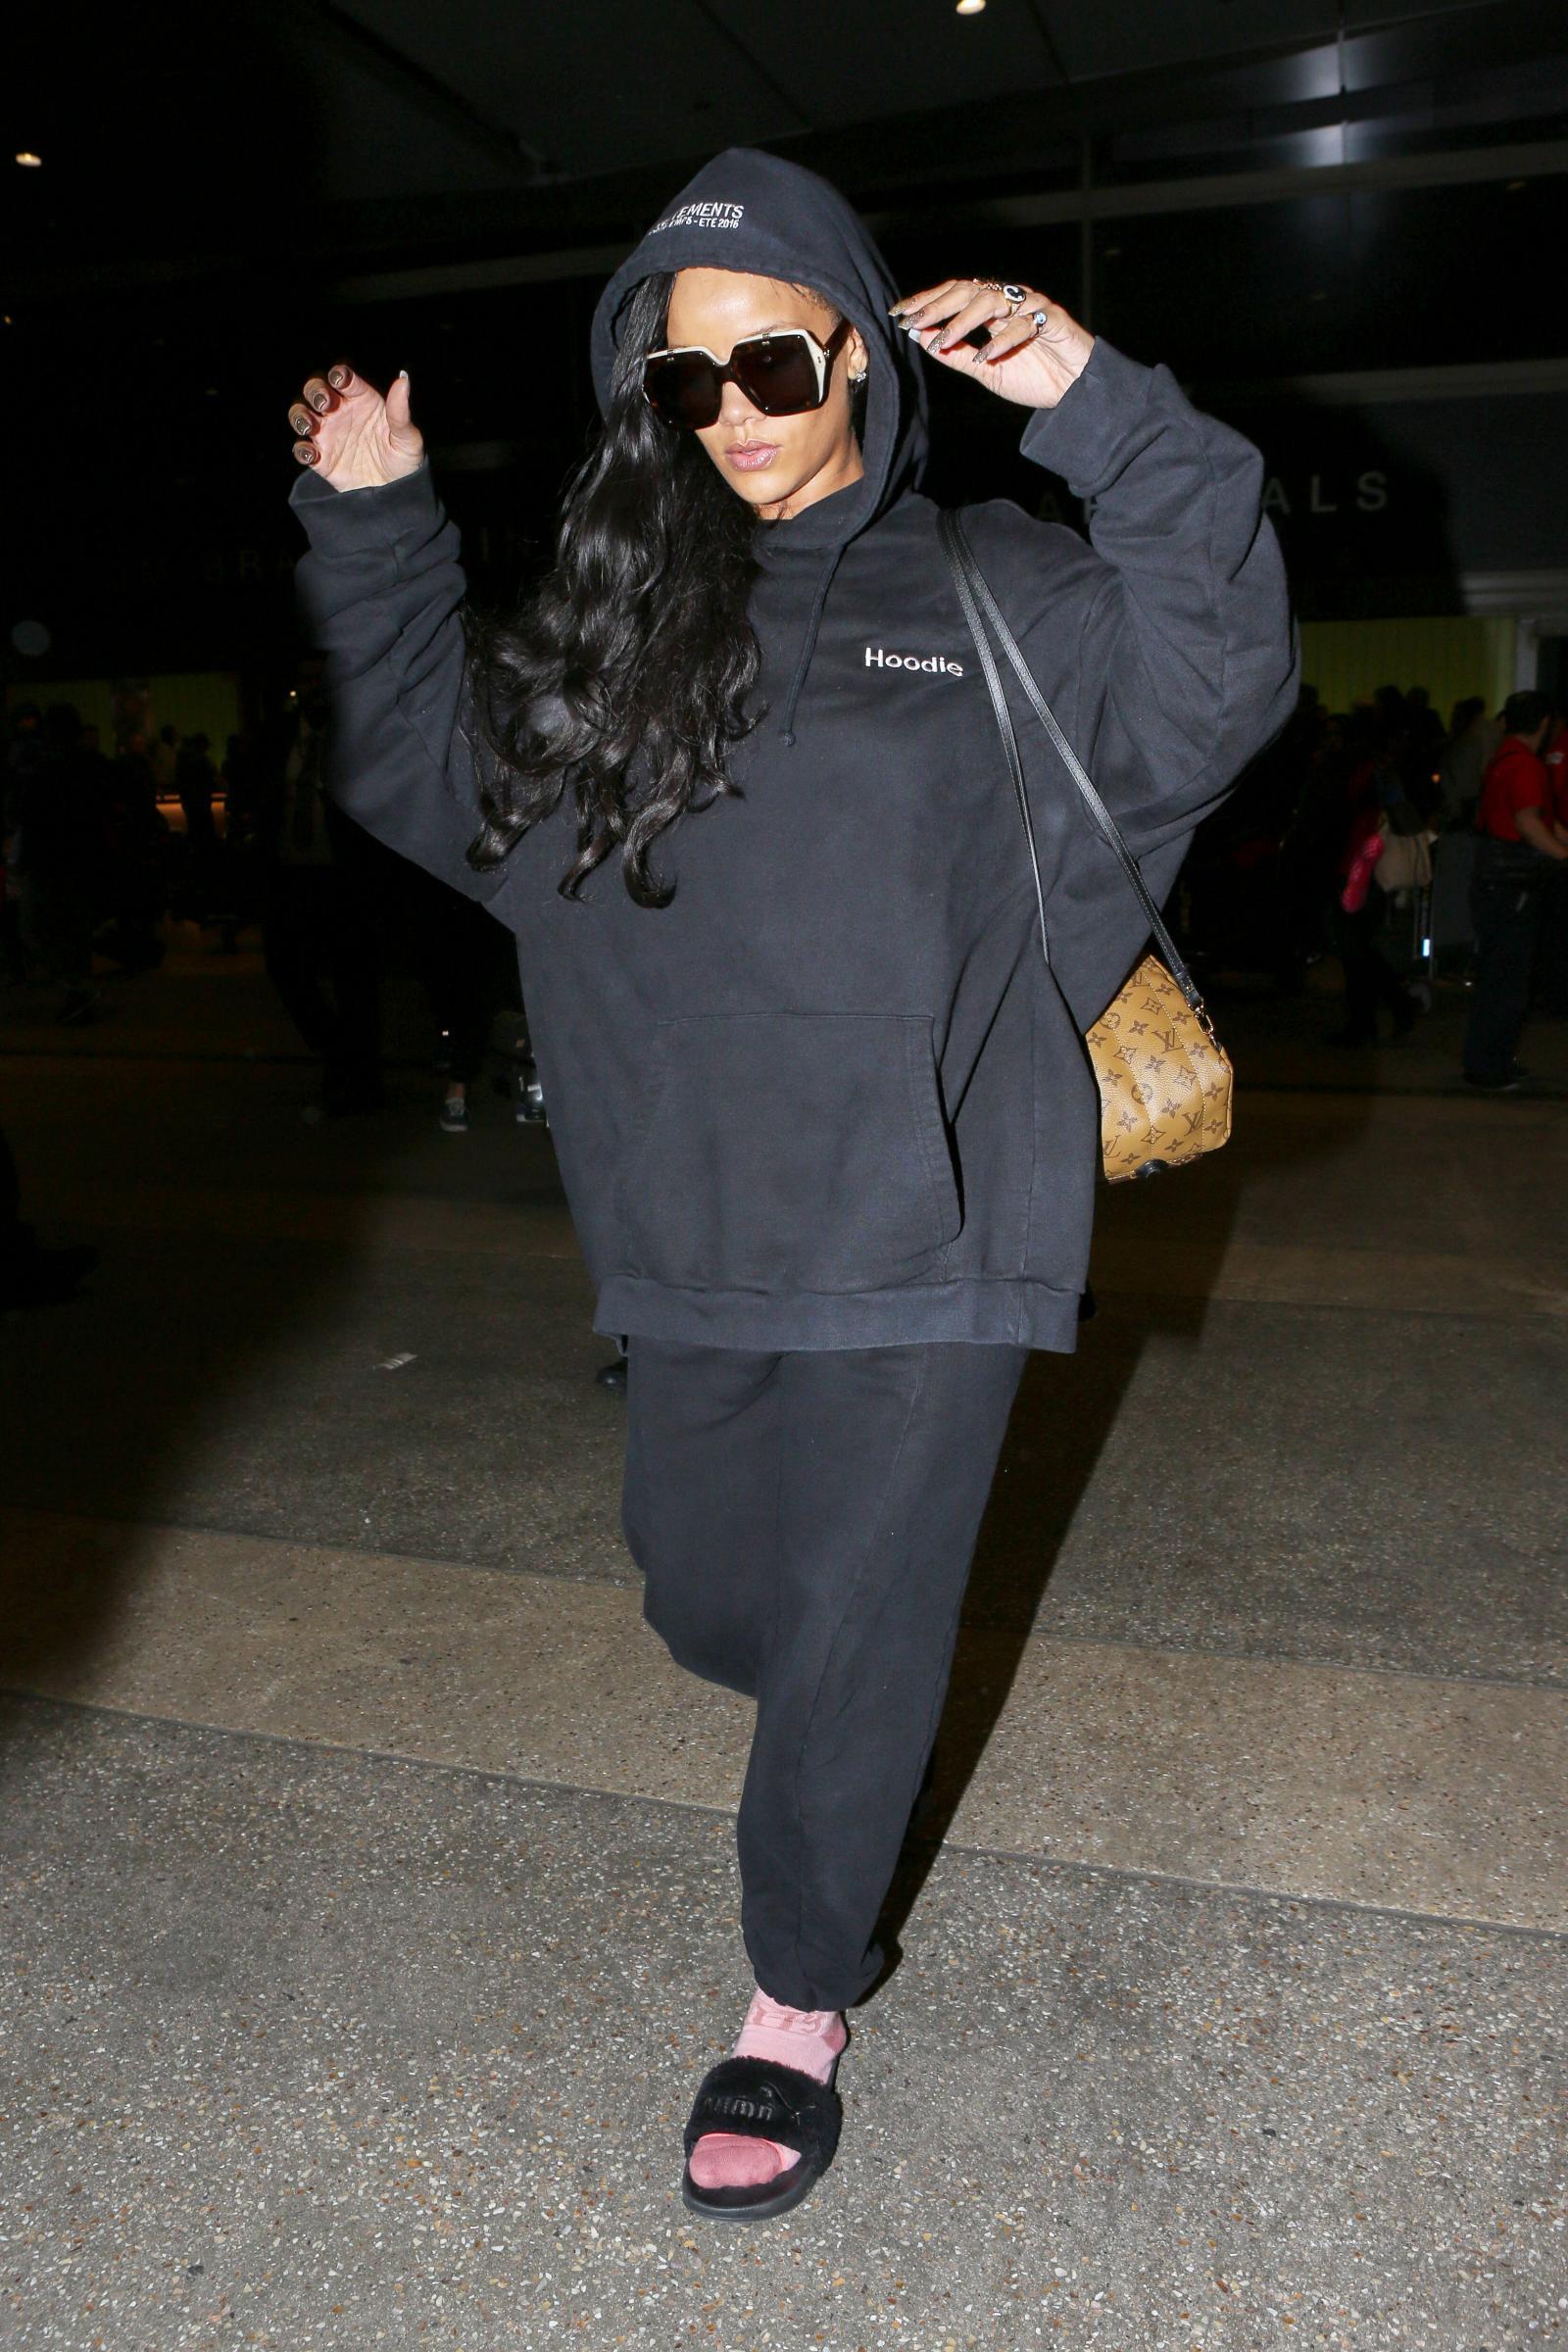 Rihanna arriva a Los Angeles in felpa e ciabatte